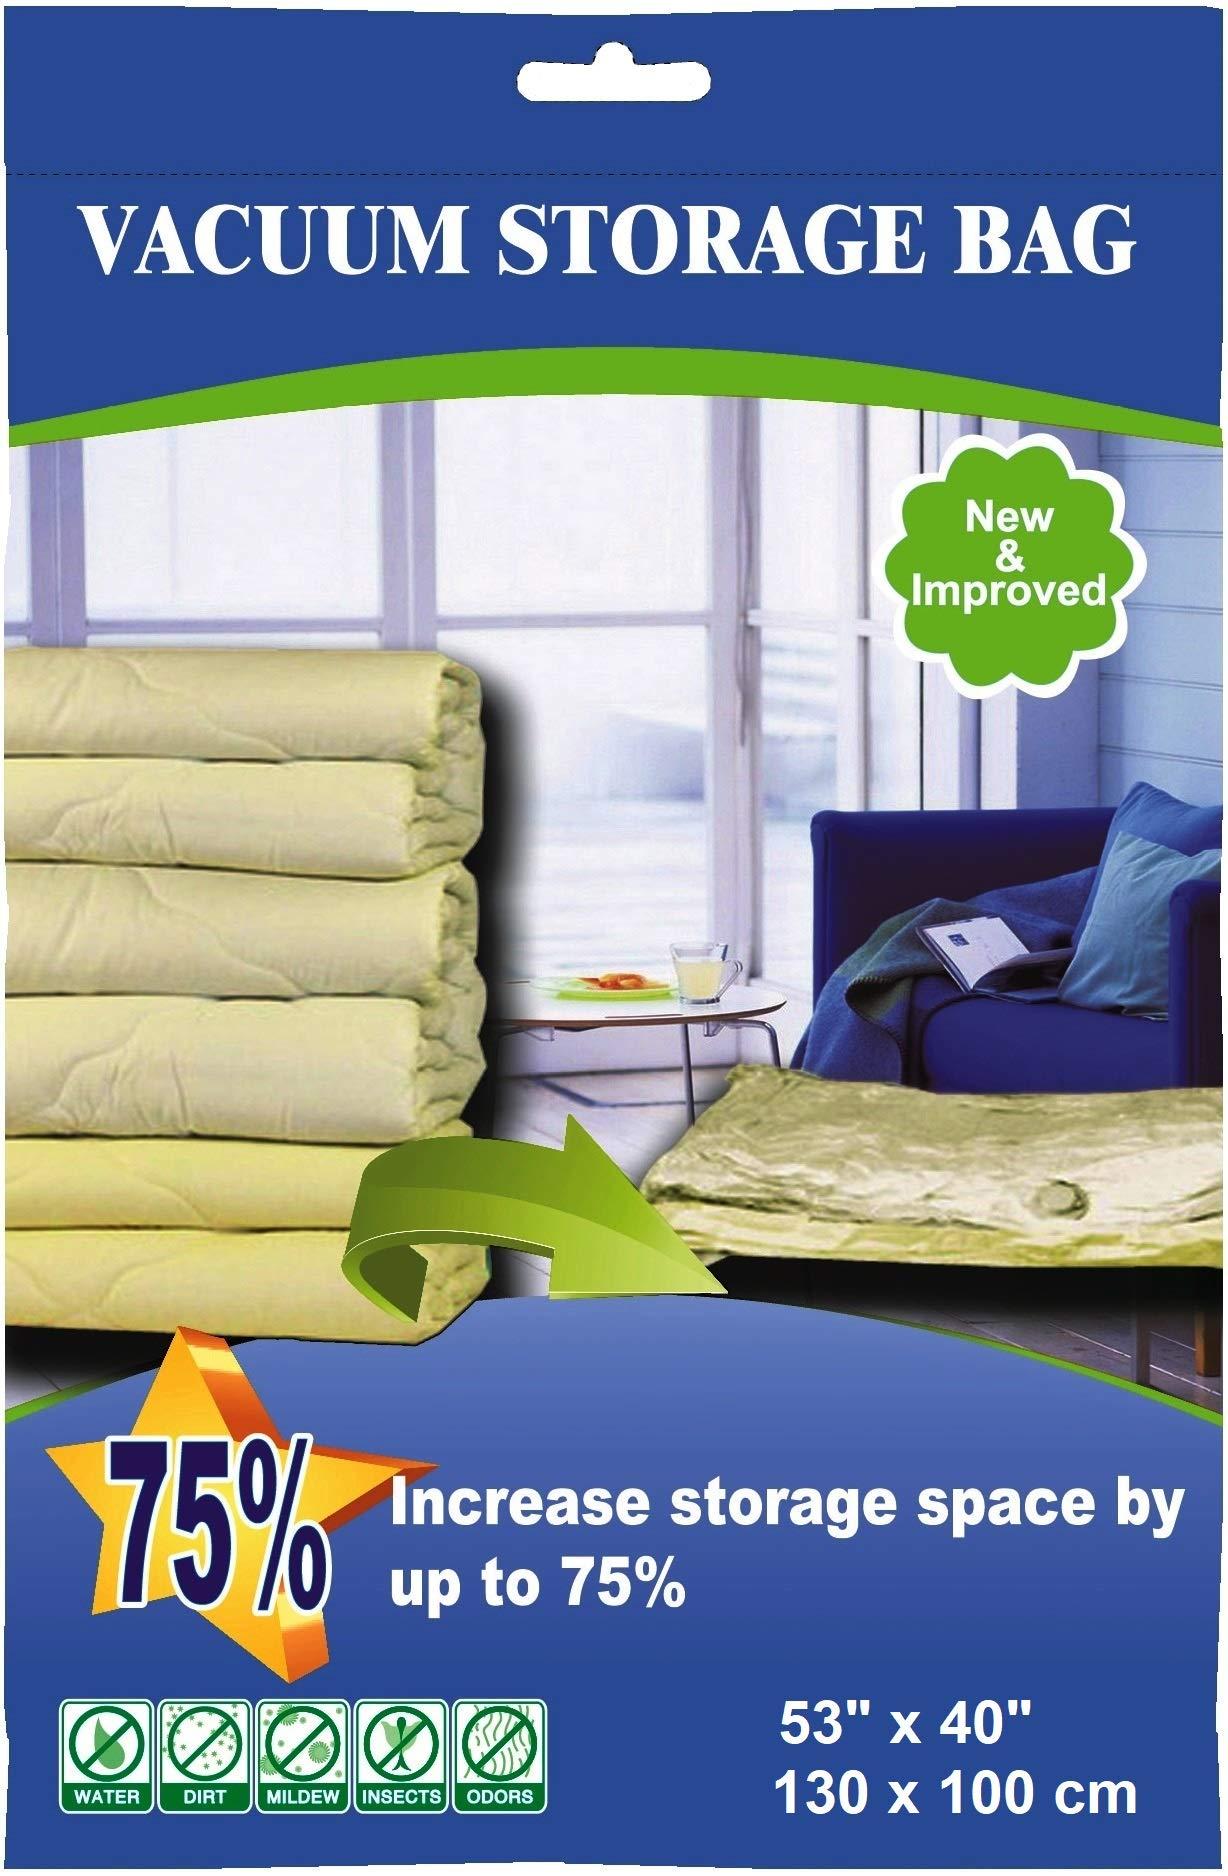 50 Pack 130cmX100cm Jumbo Space Saver Vacuum Storage Bag at Wholesaler for Storage Organization by istoragebag